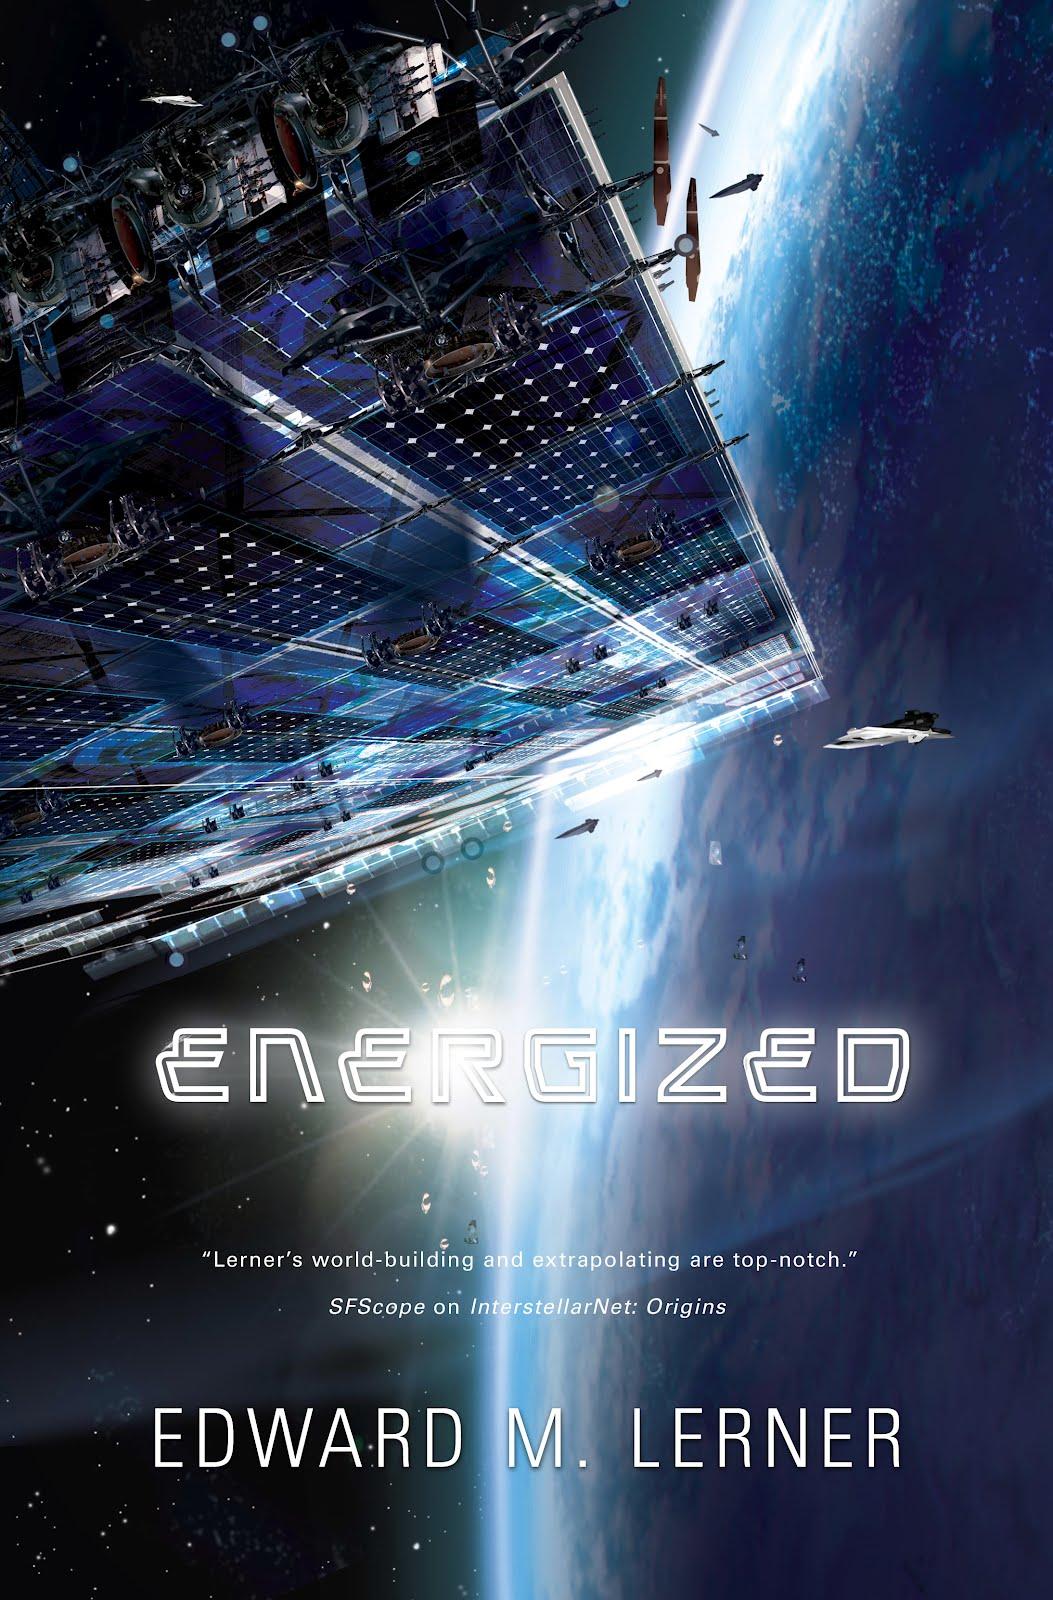 http://blog.edwardmlerner.com/2012/07/energized.html